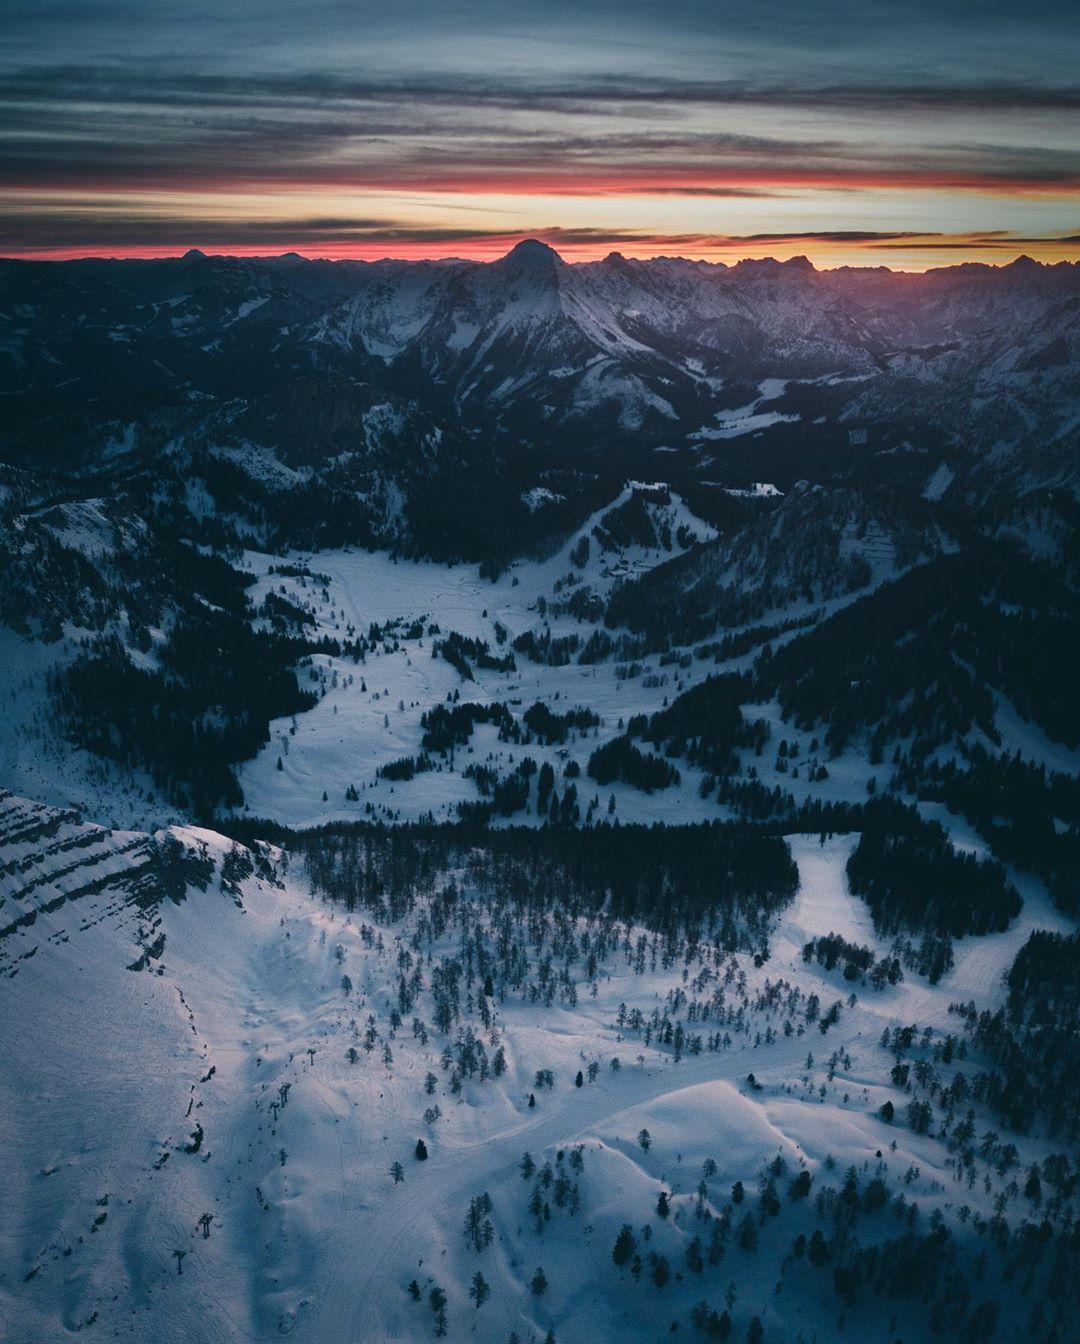 Winter panorama at sunset